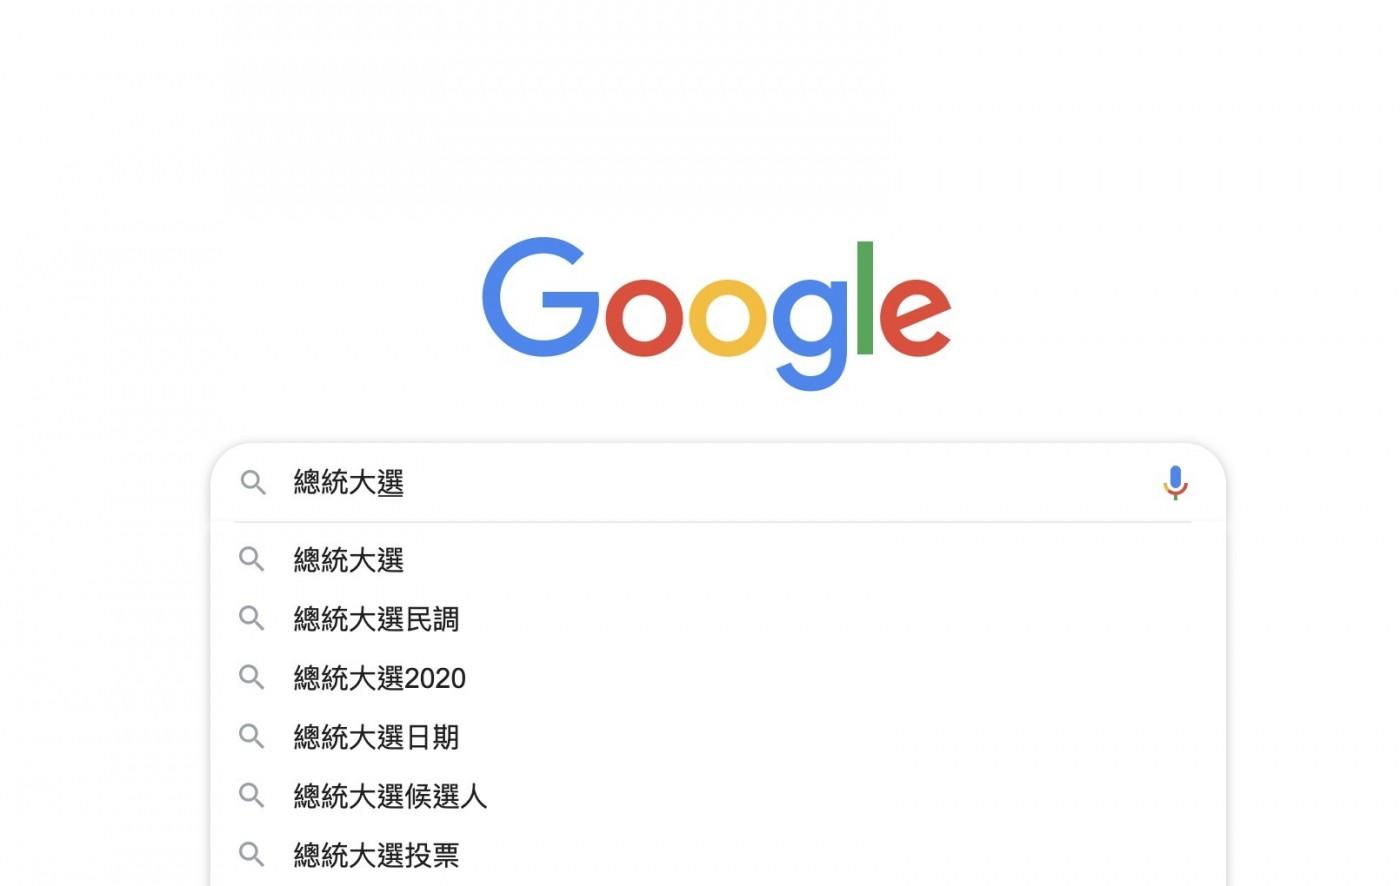 Google封印台灣「政治廣告」,為何卻說找YouTuber合作不受限?